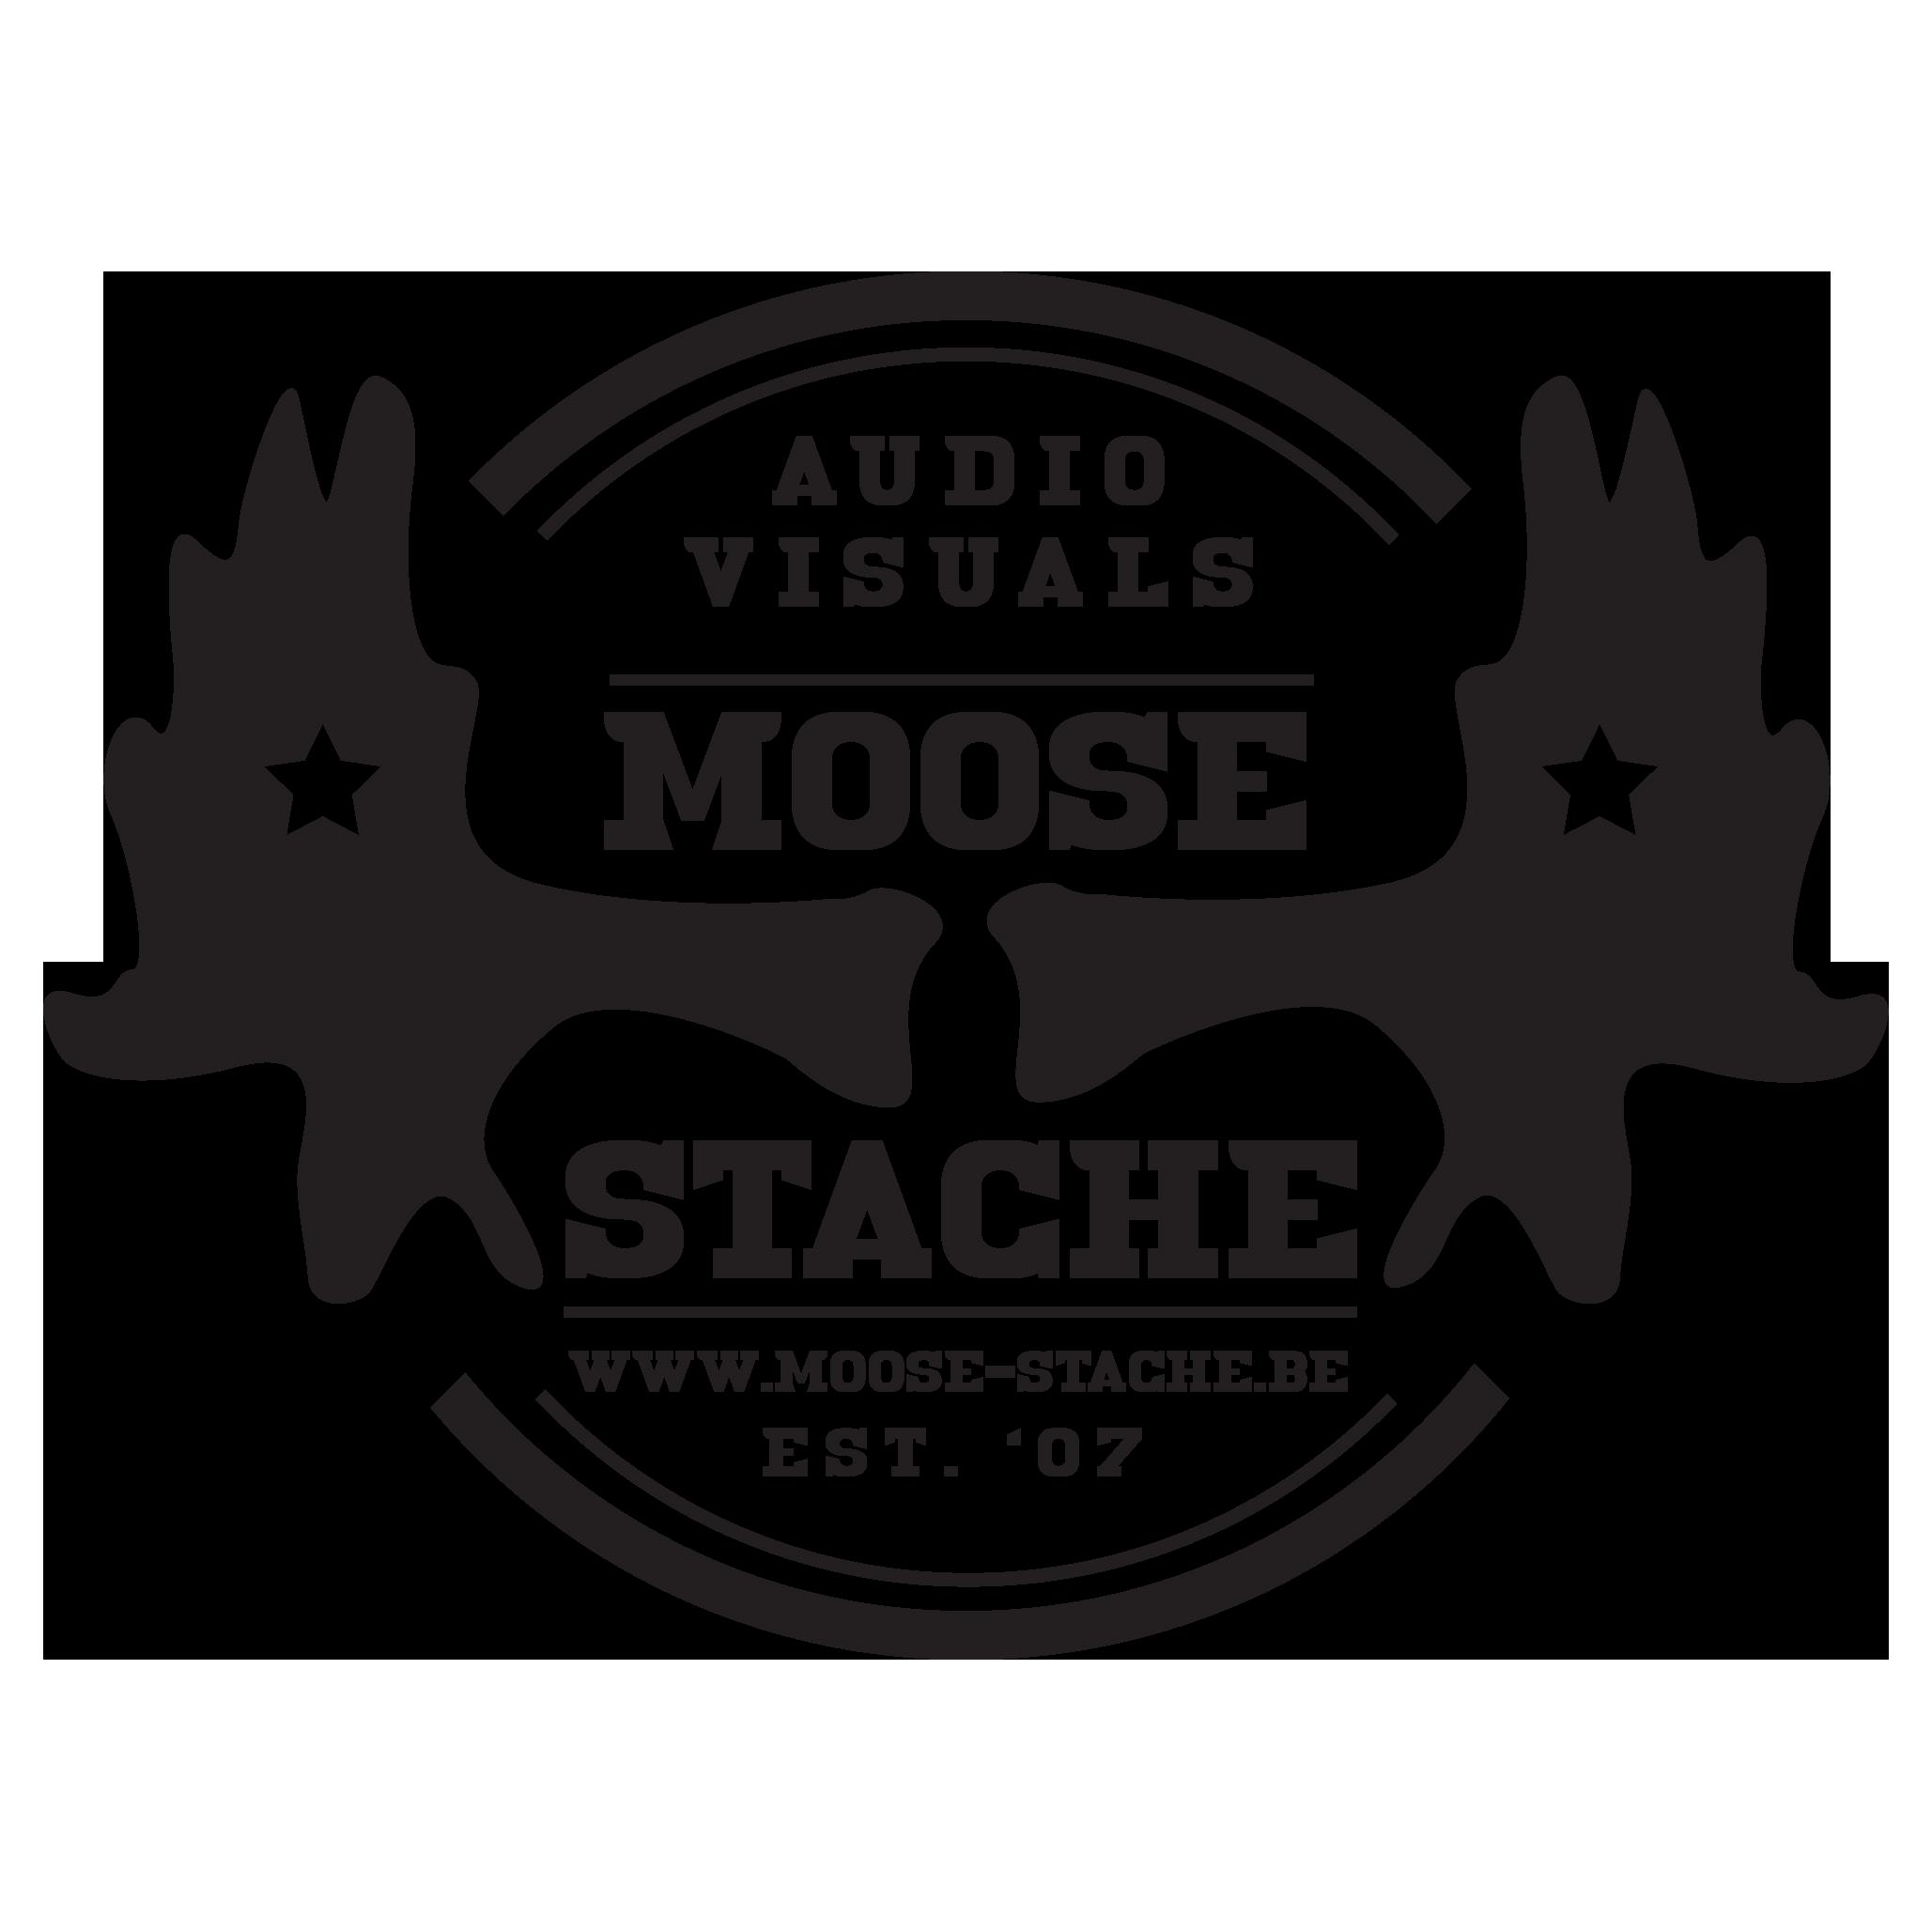 Moose-Stache BVBA